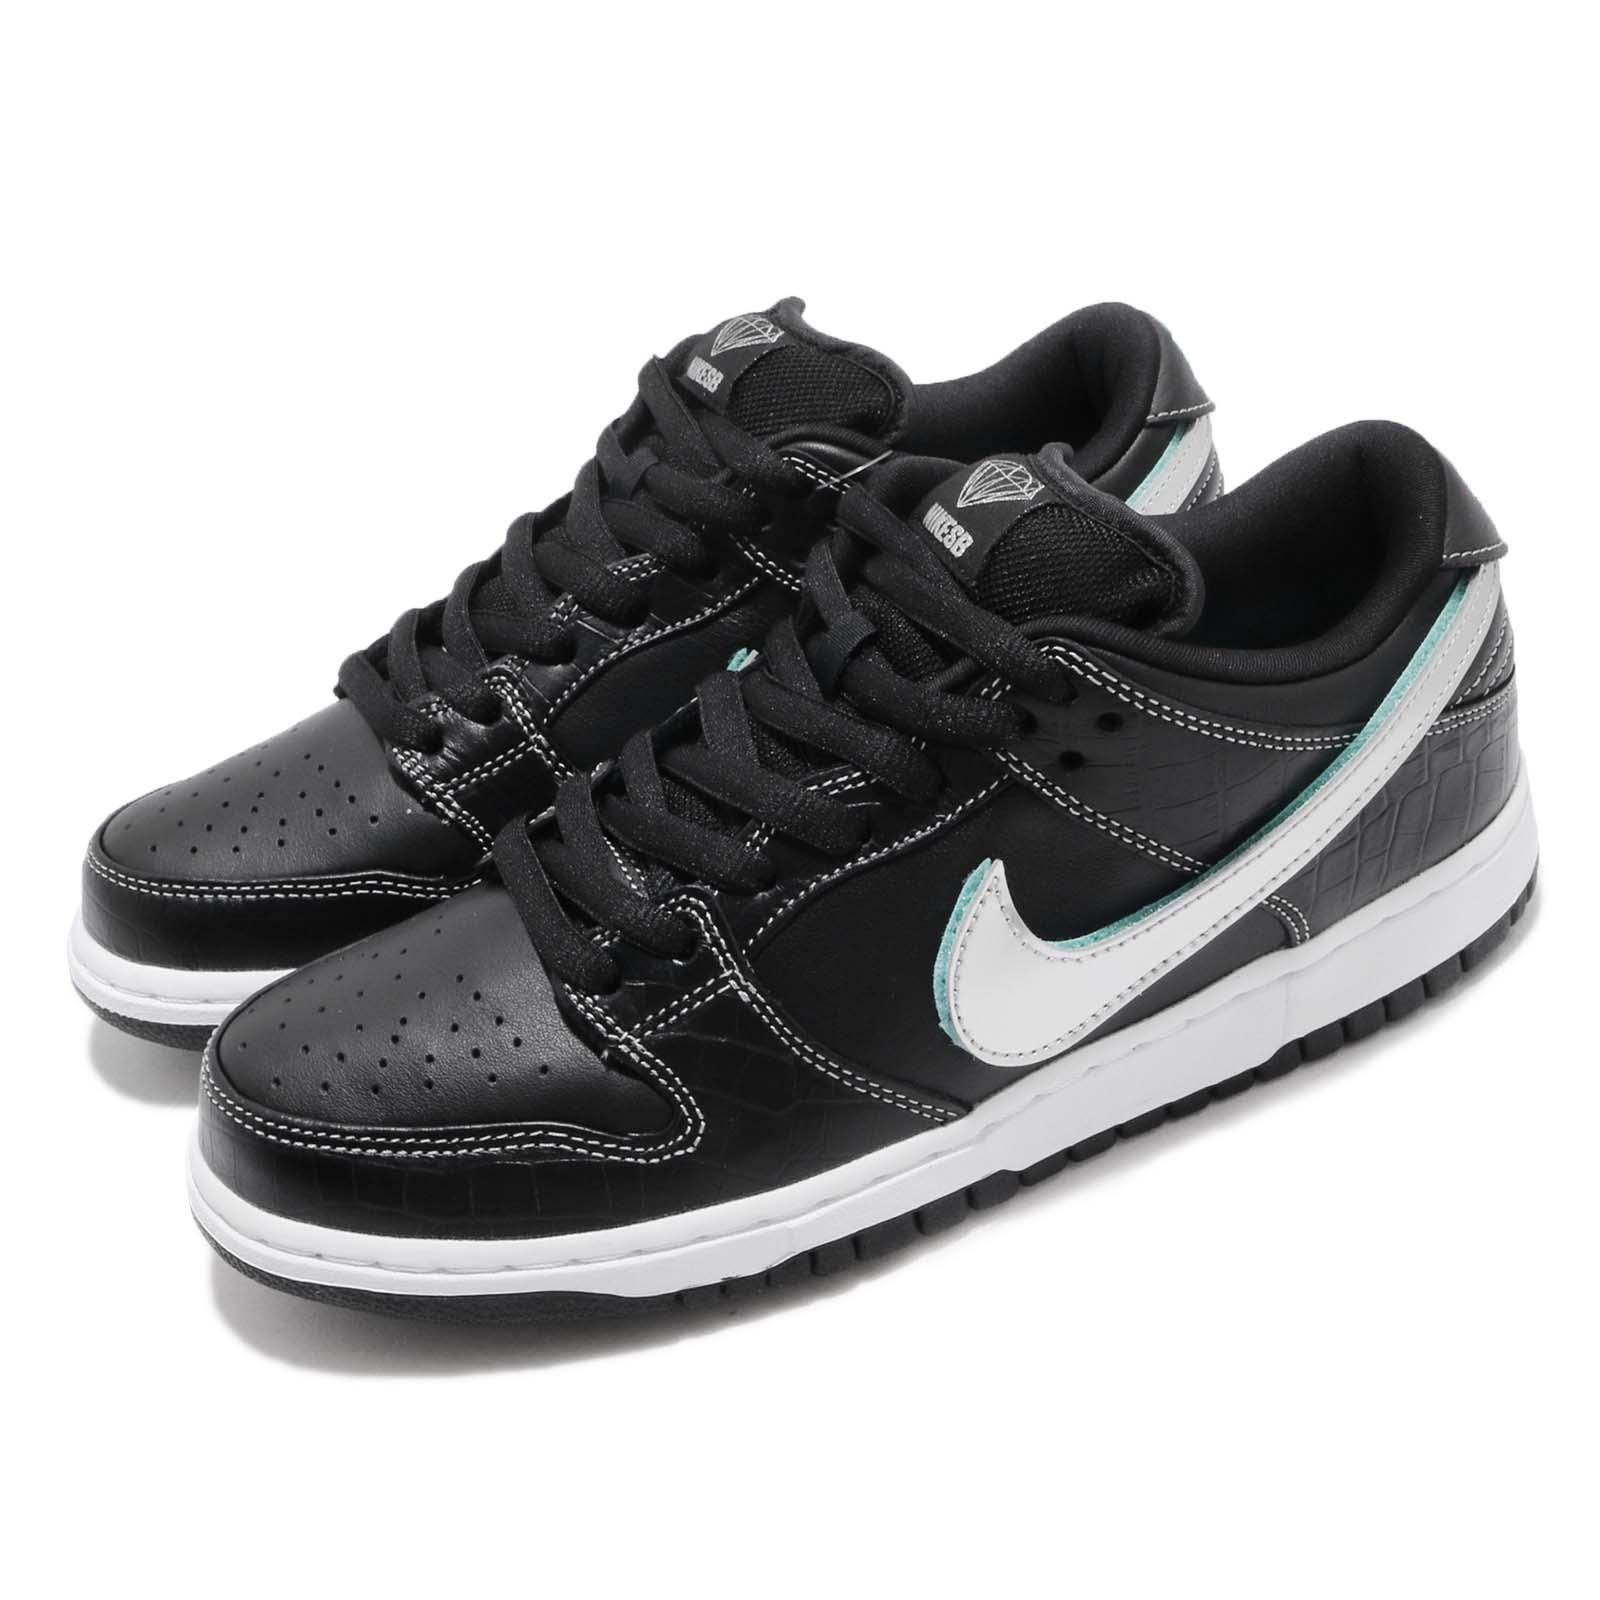 Nike 休閒鞋 SB Dunk 限量 鑽石 男女鞋 BV1310-001